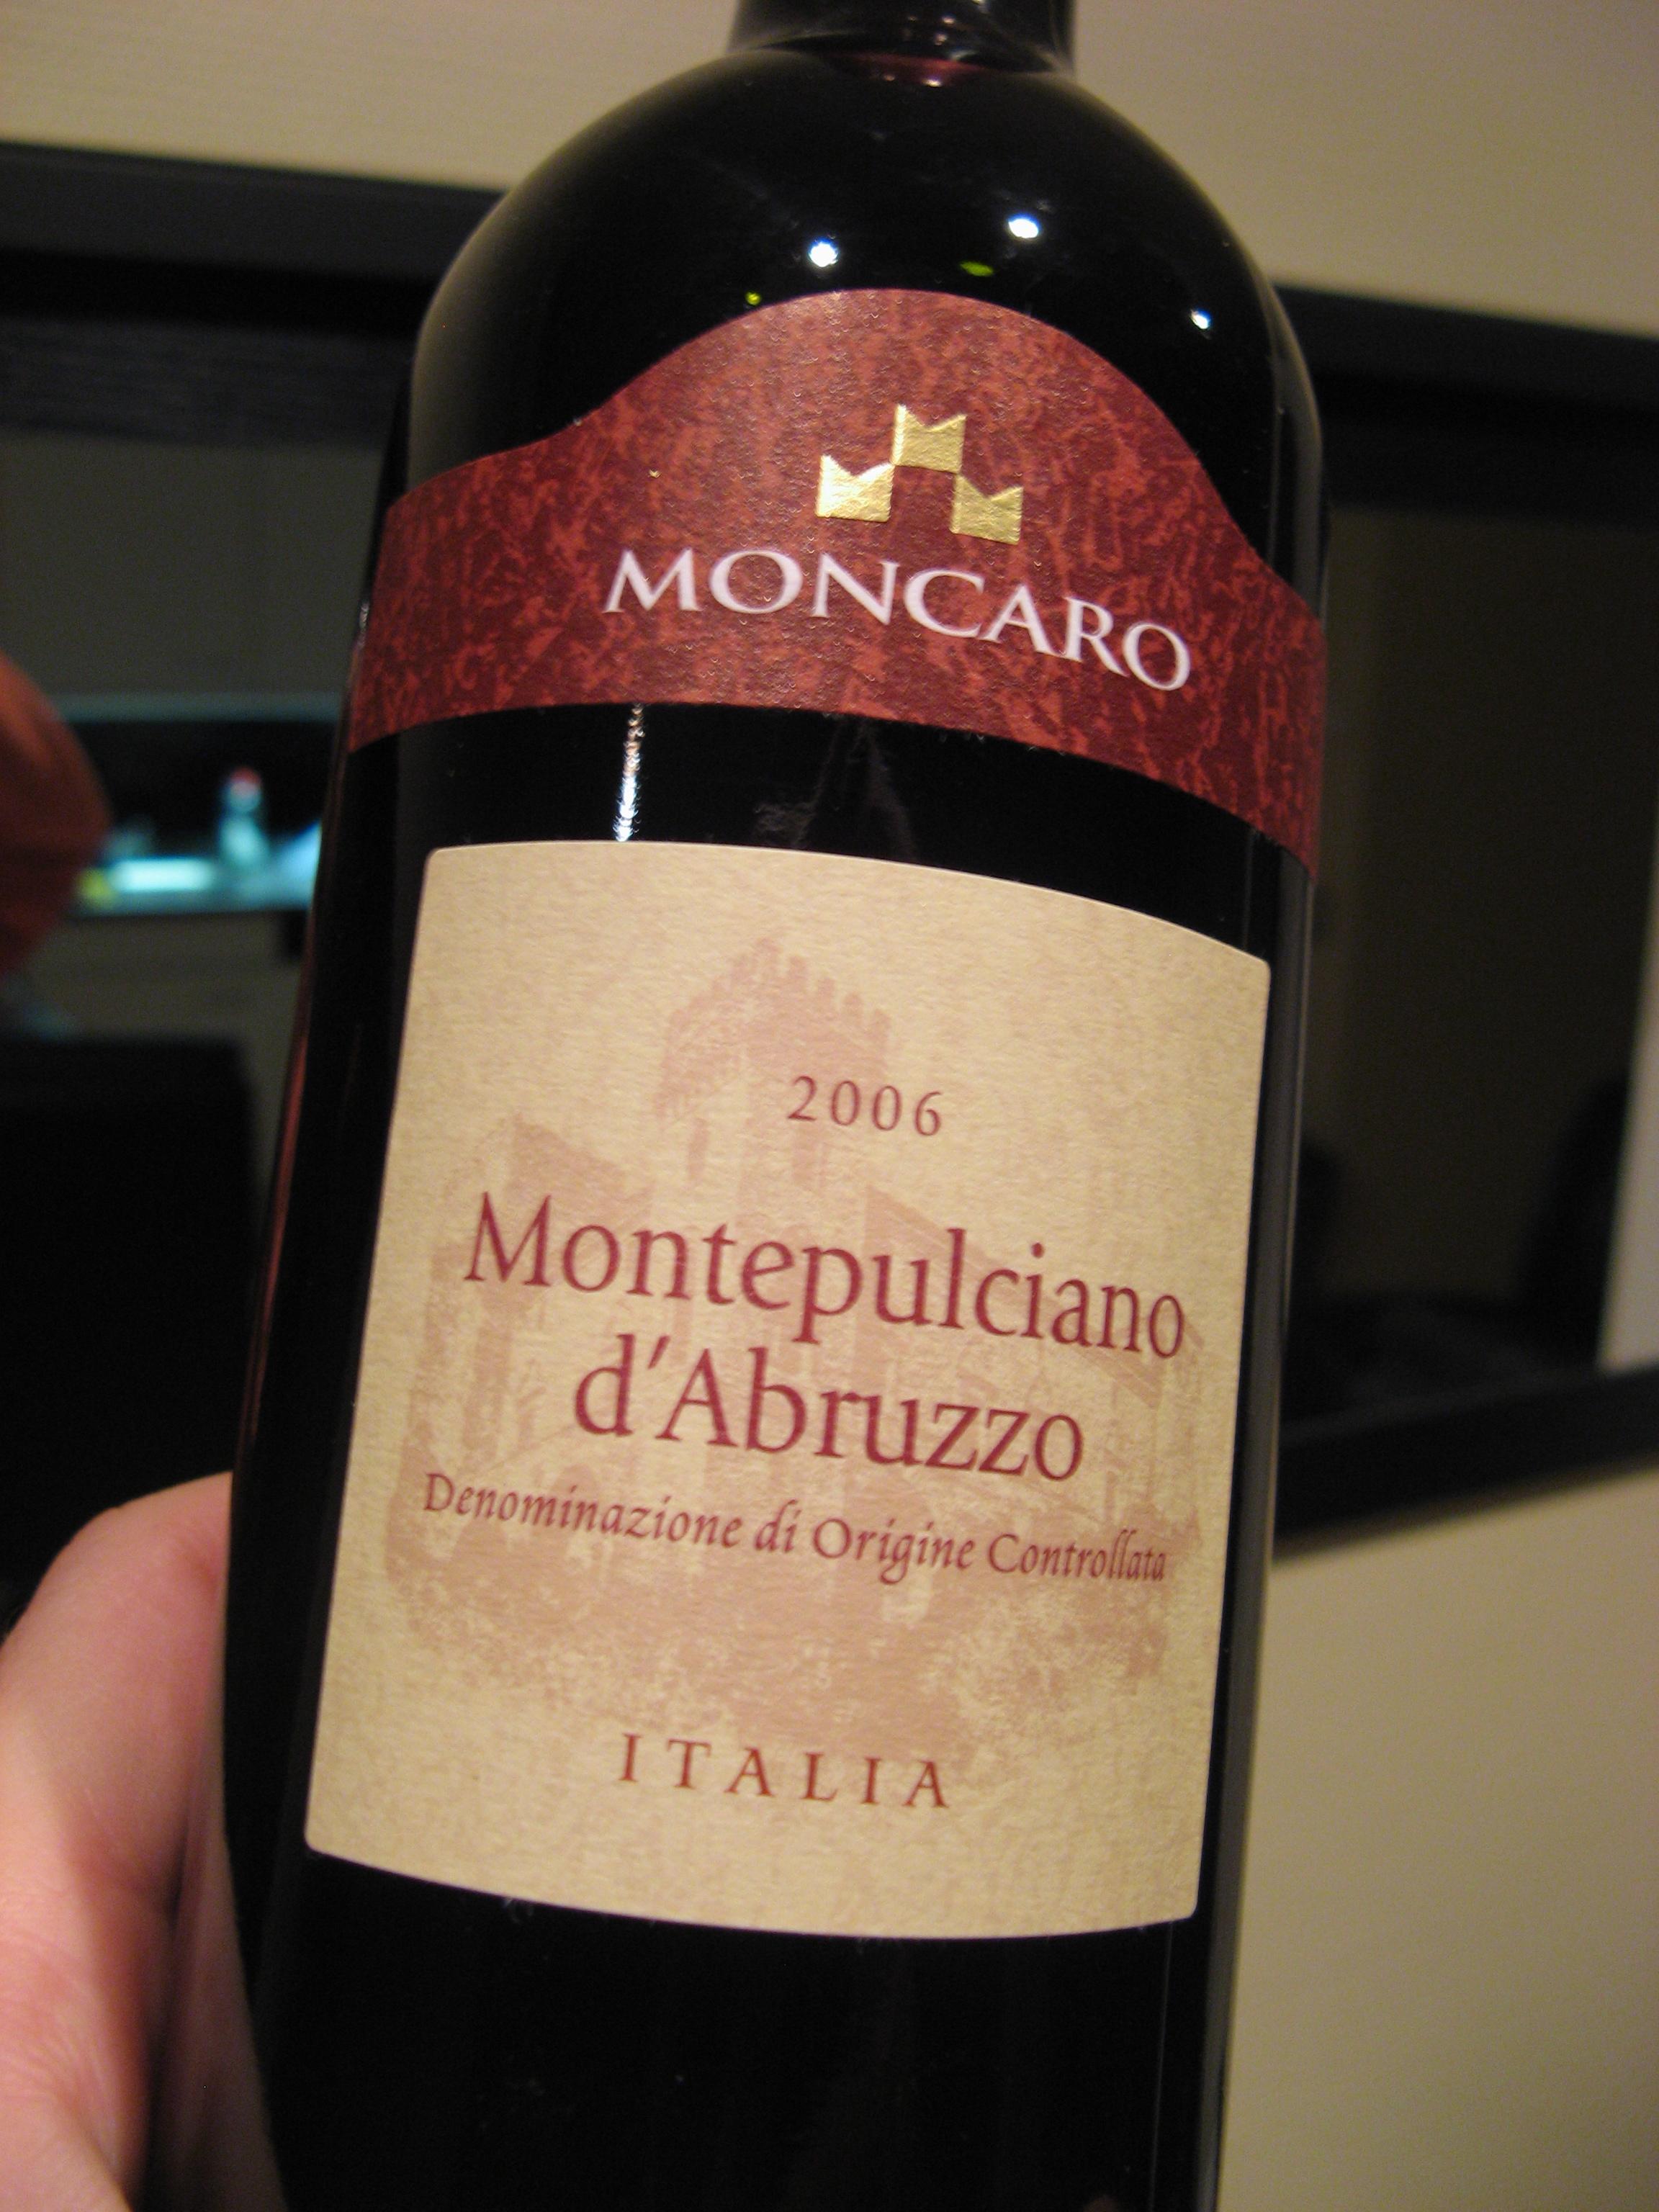 t 1715 dabruzzo montepulciano - photo#2